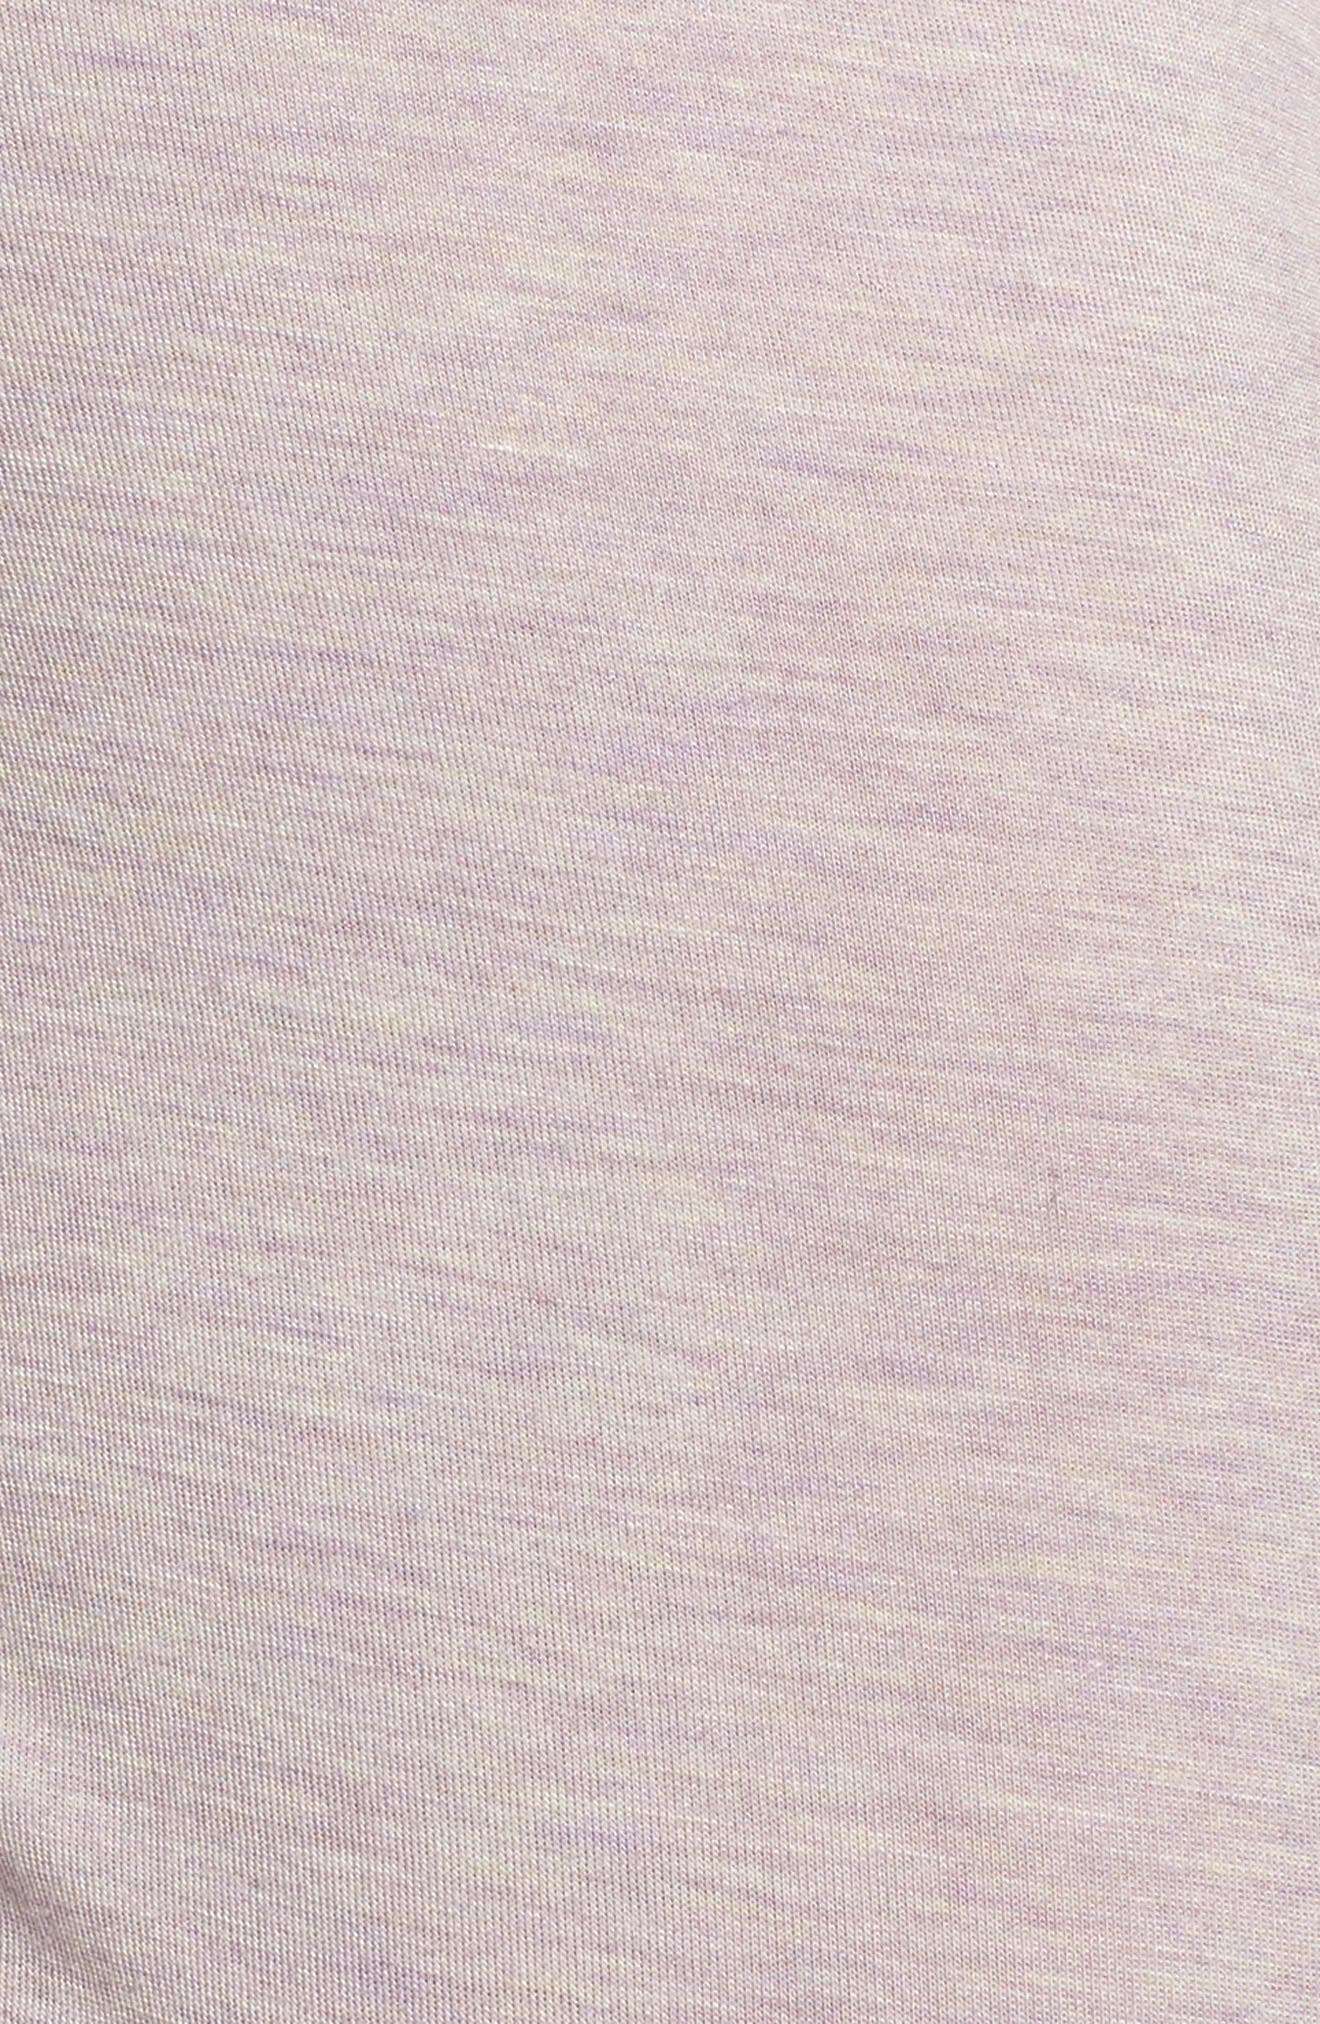 Lenon Jersey Pajamas,                             Alternate thumbnail 6, color,                             Lavender Fog Heather